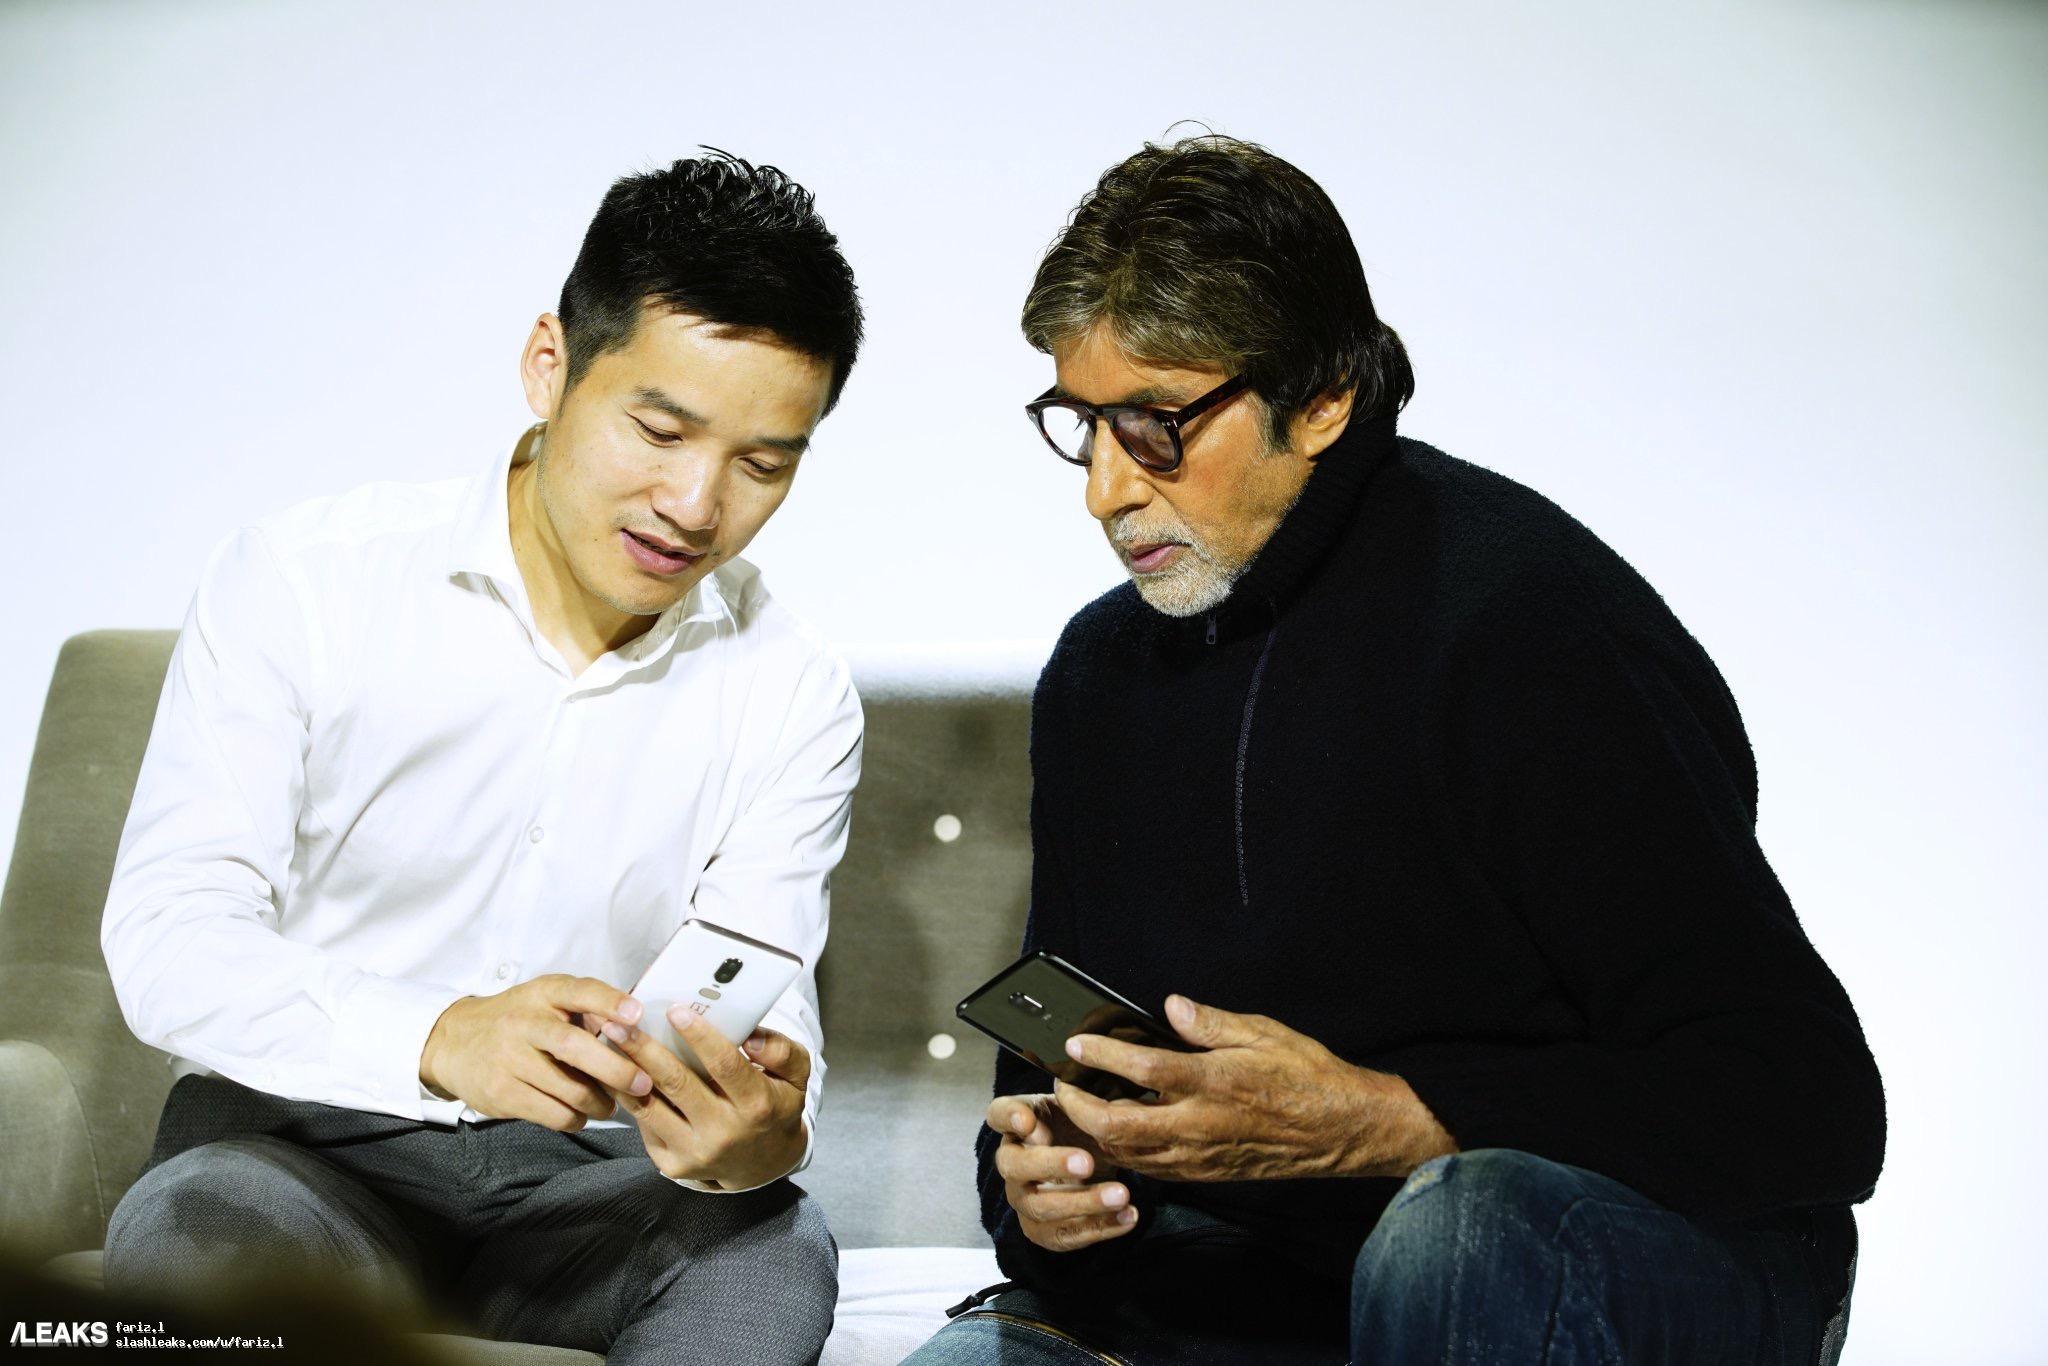 Руководитель OnePlus показал OnePlus 6 вживую